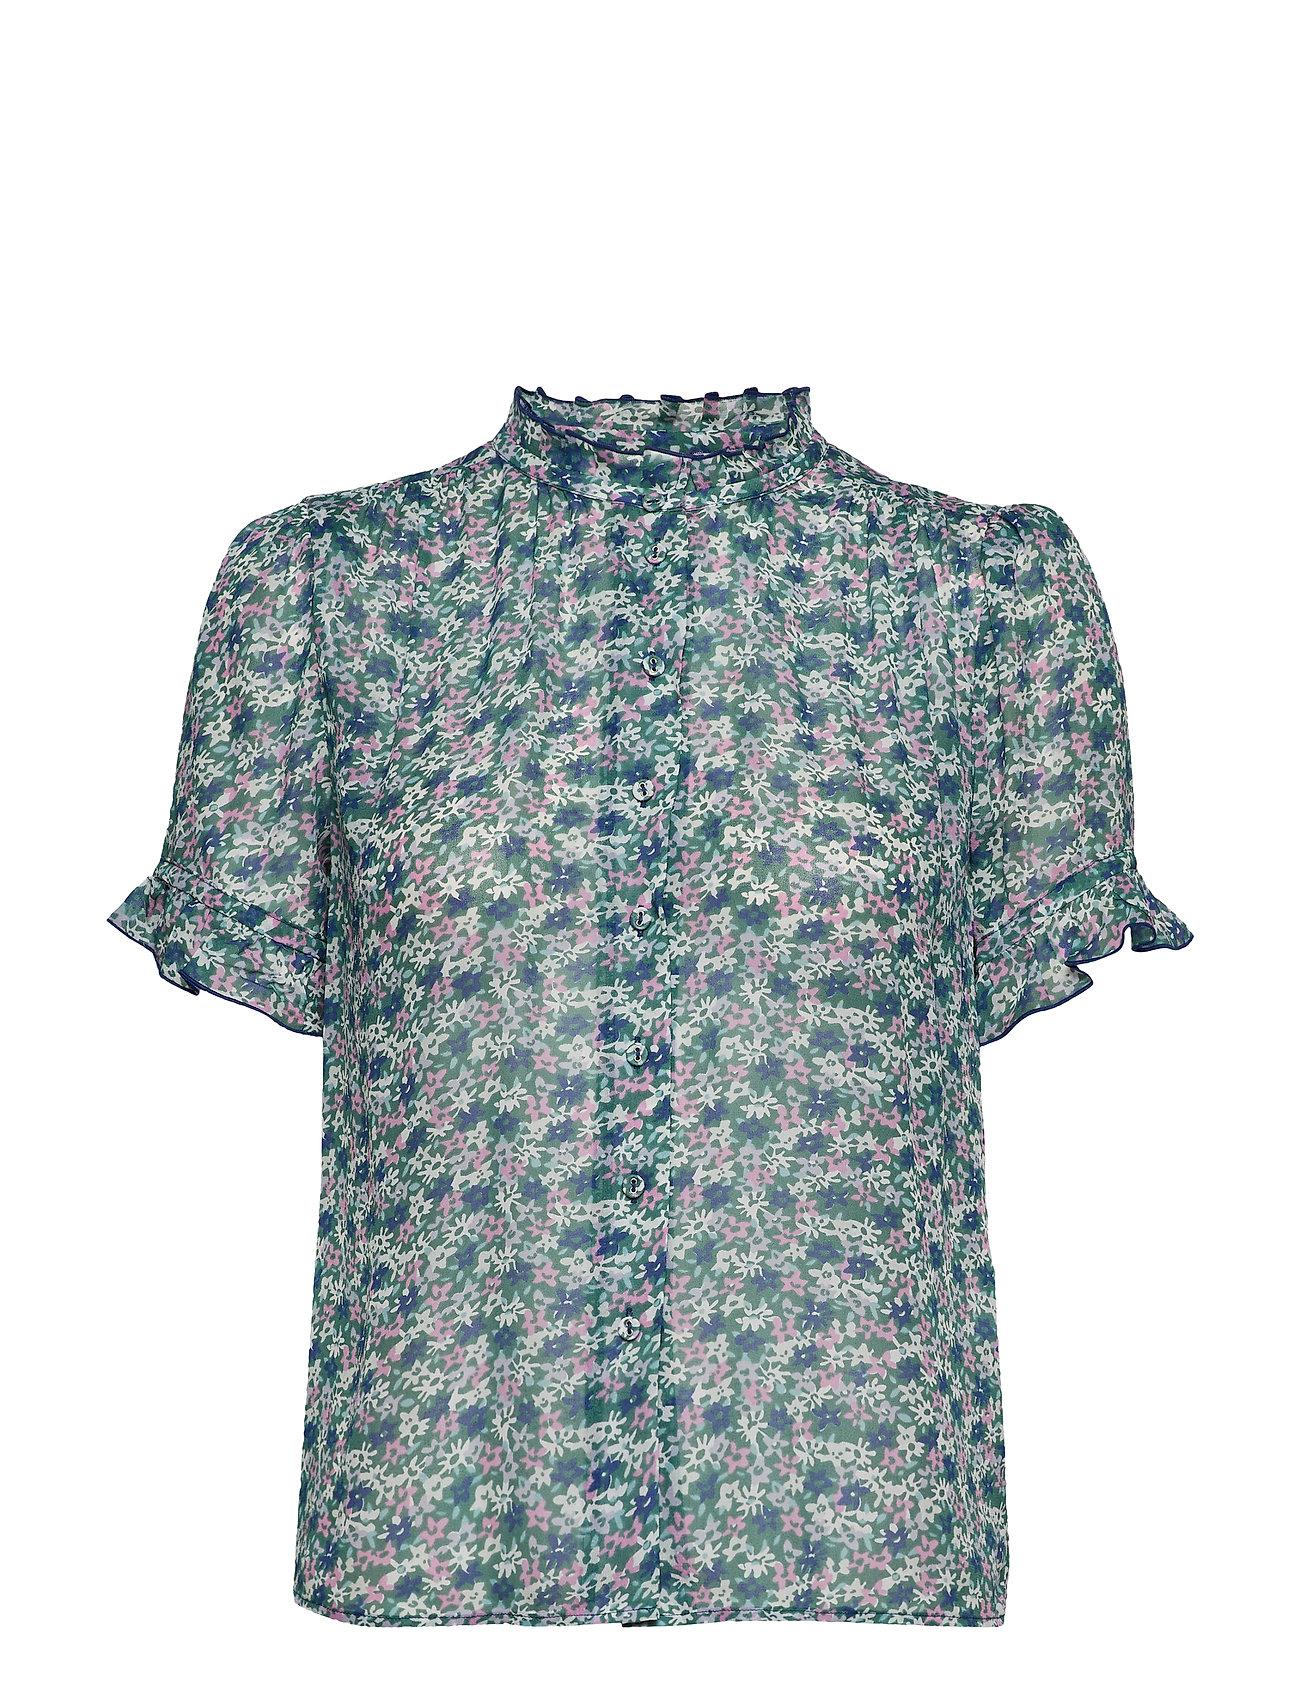 Samsøe & Samsøe Rosella shirt aop 9695 - FORGET ME NOT